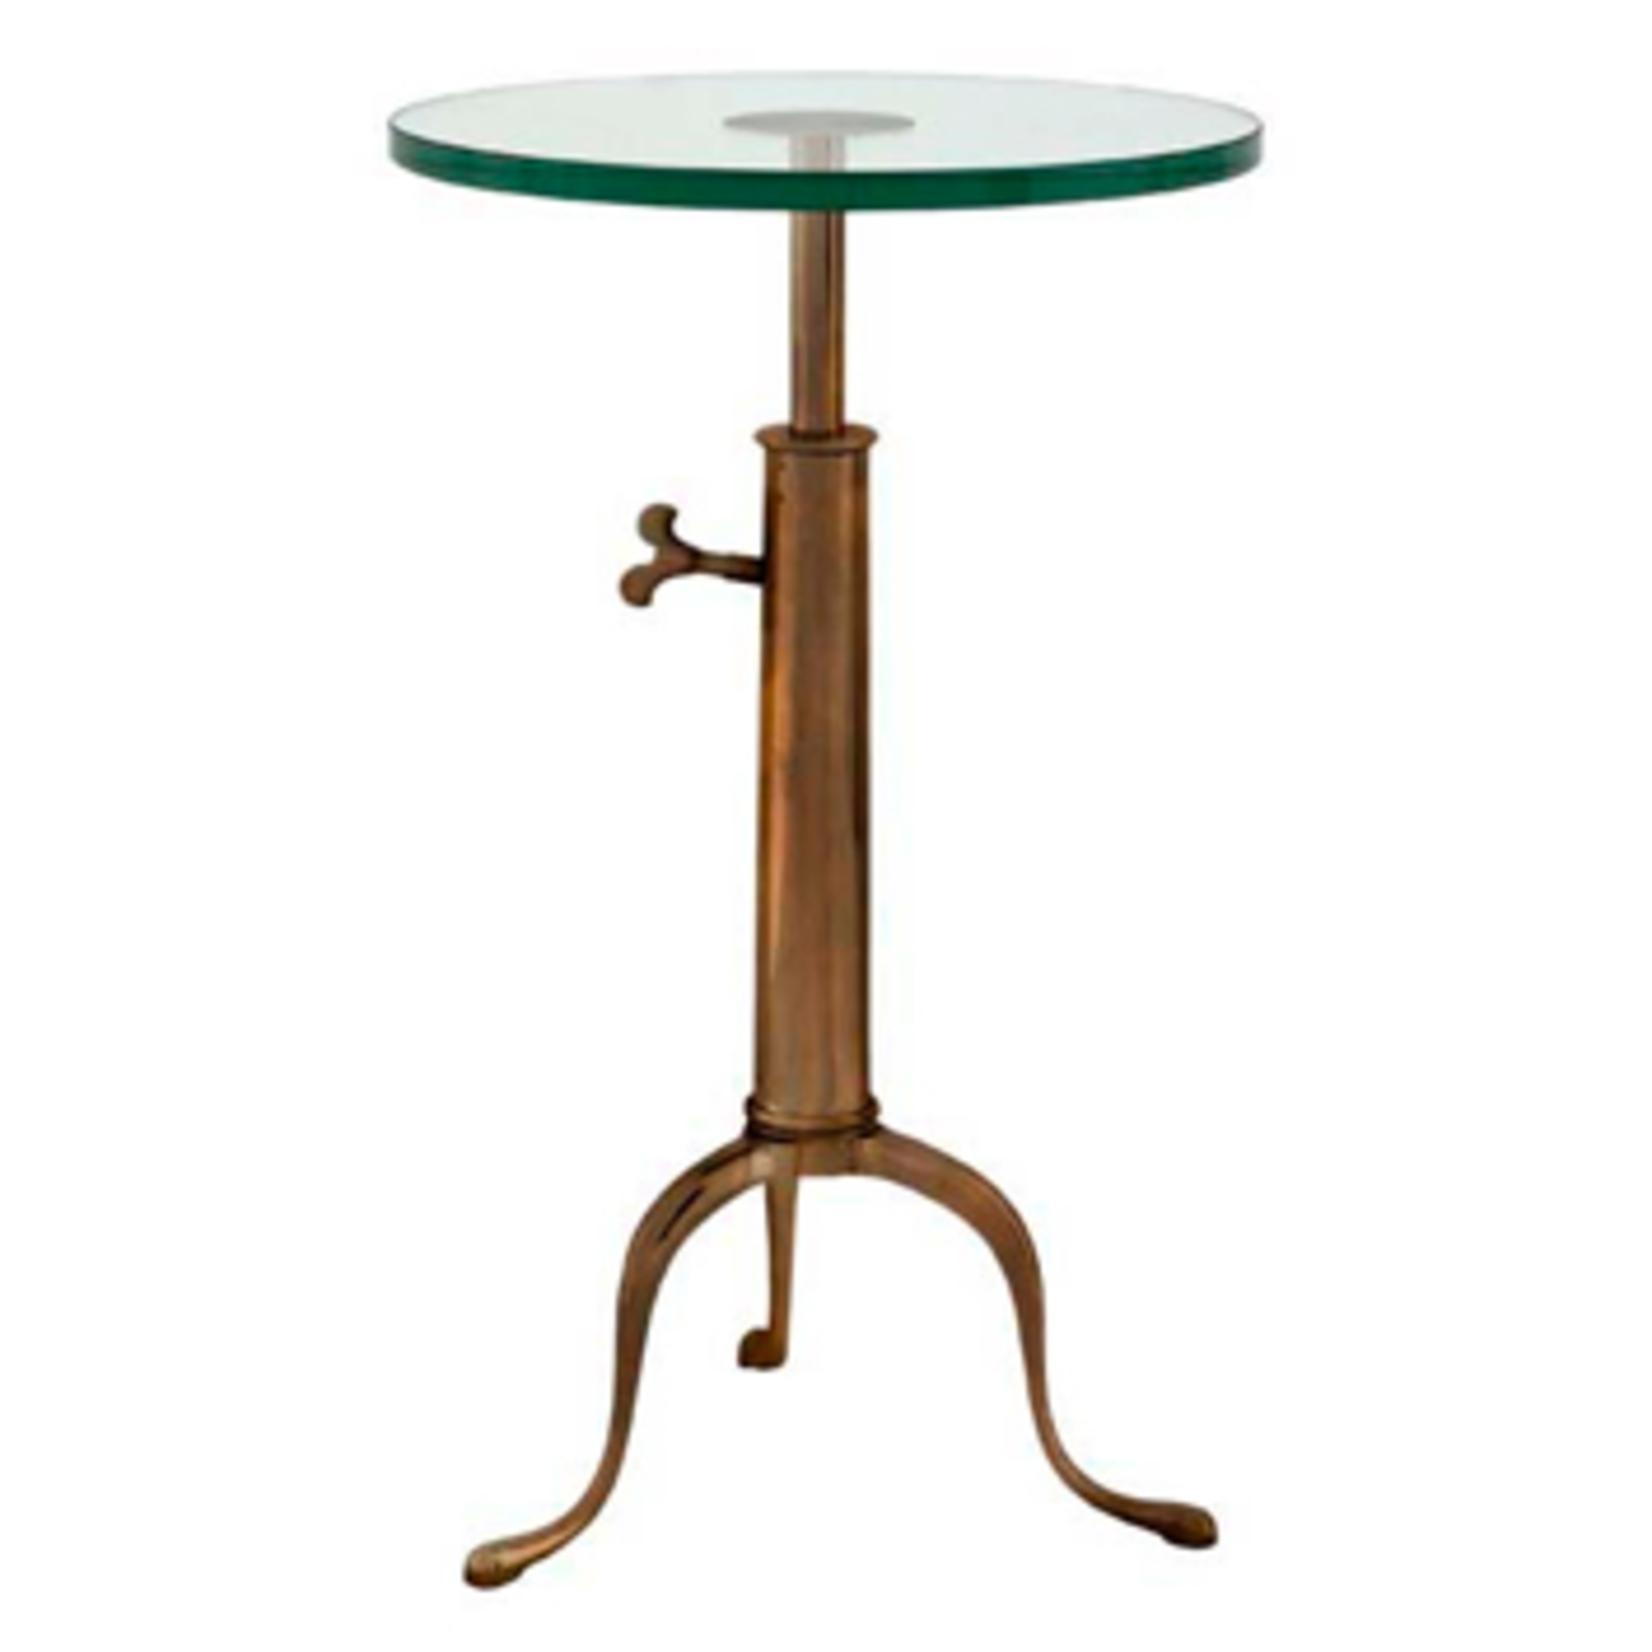 EICHHOLTZ TABLE BROMPTON ANTIC BRASS